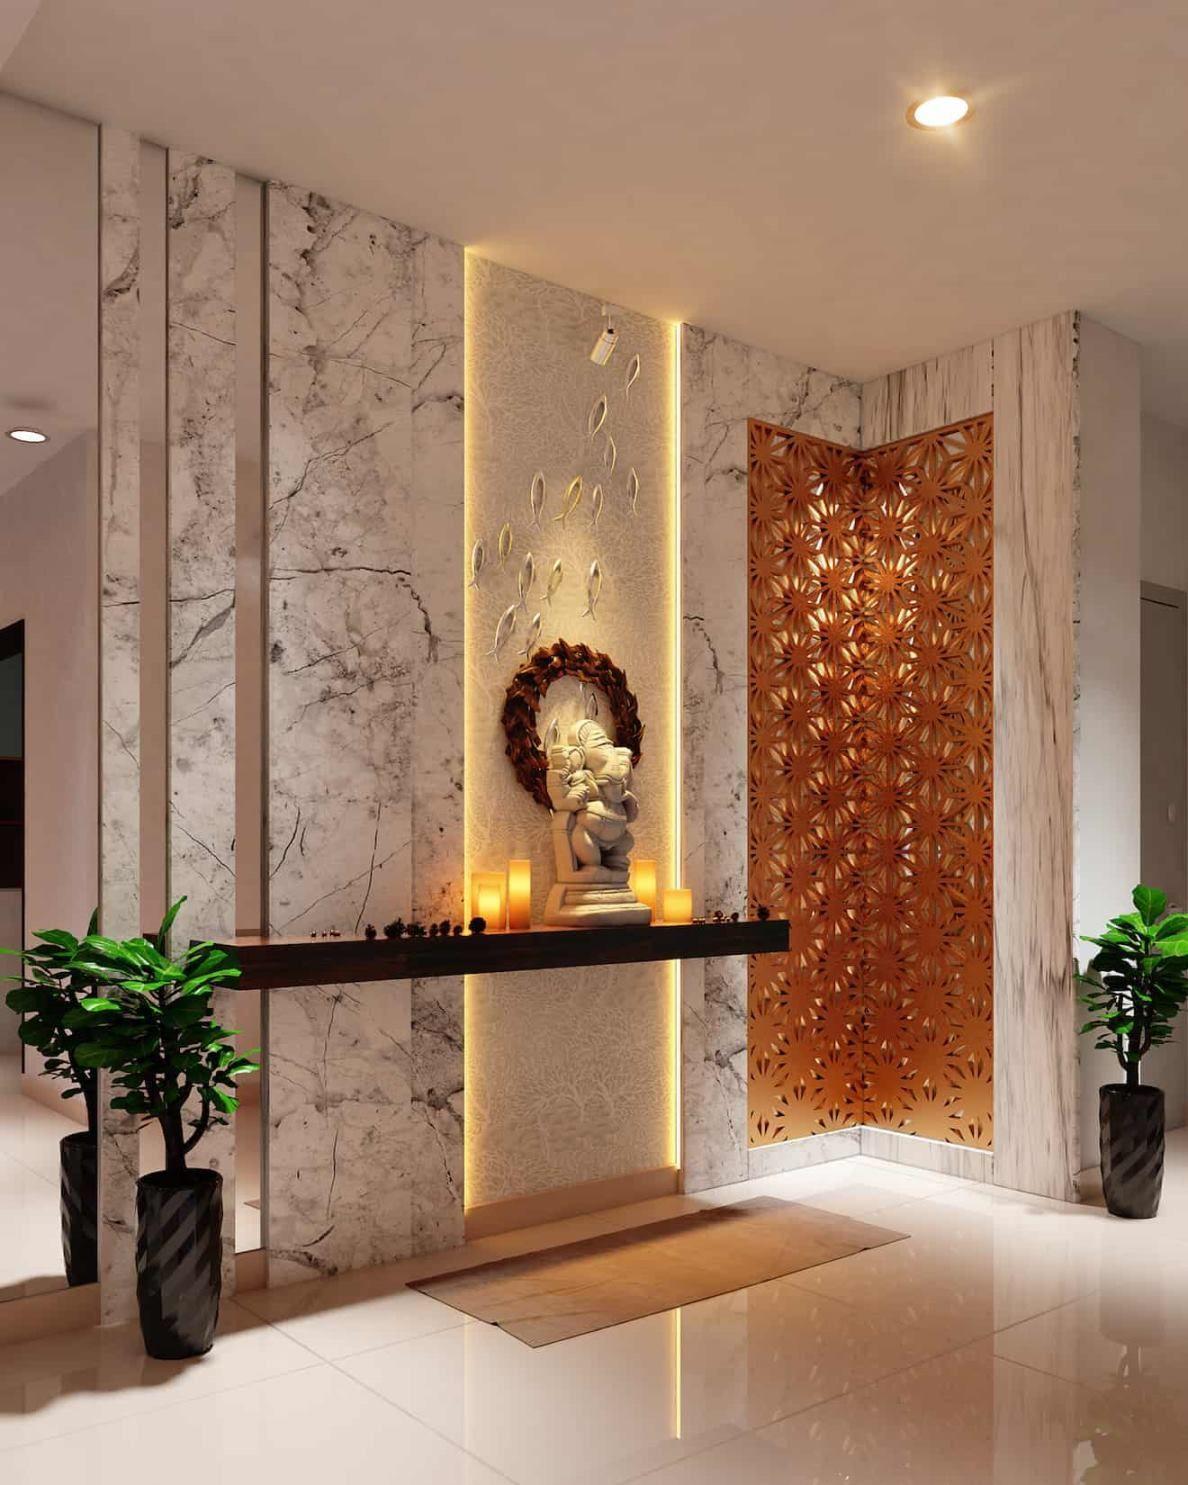 Best Tips On Industrial Living Rooms Insplosion Interior Wall Design Home Entrance Decor Pooja Room Design